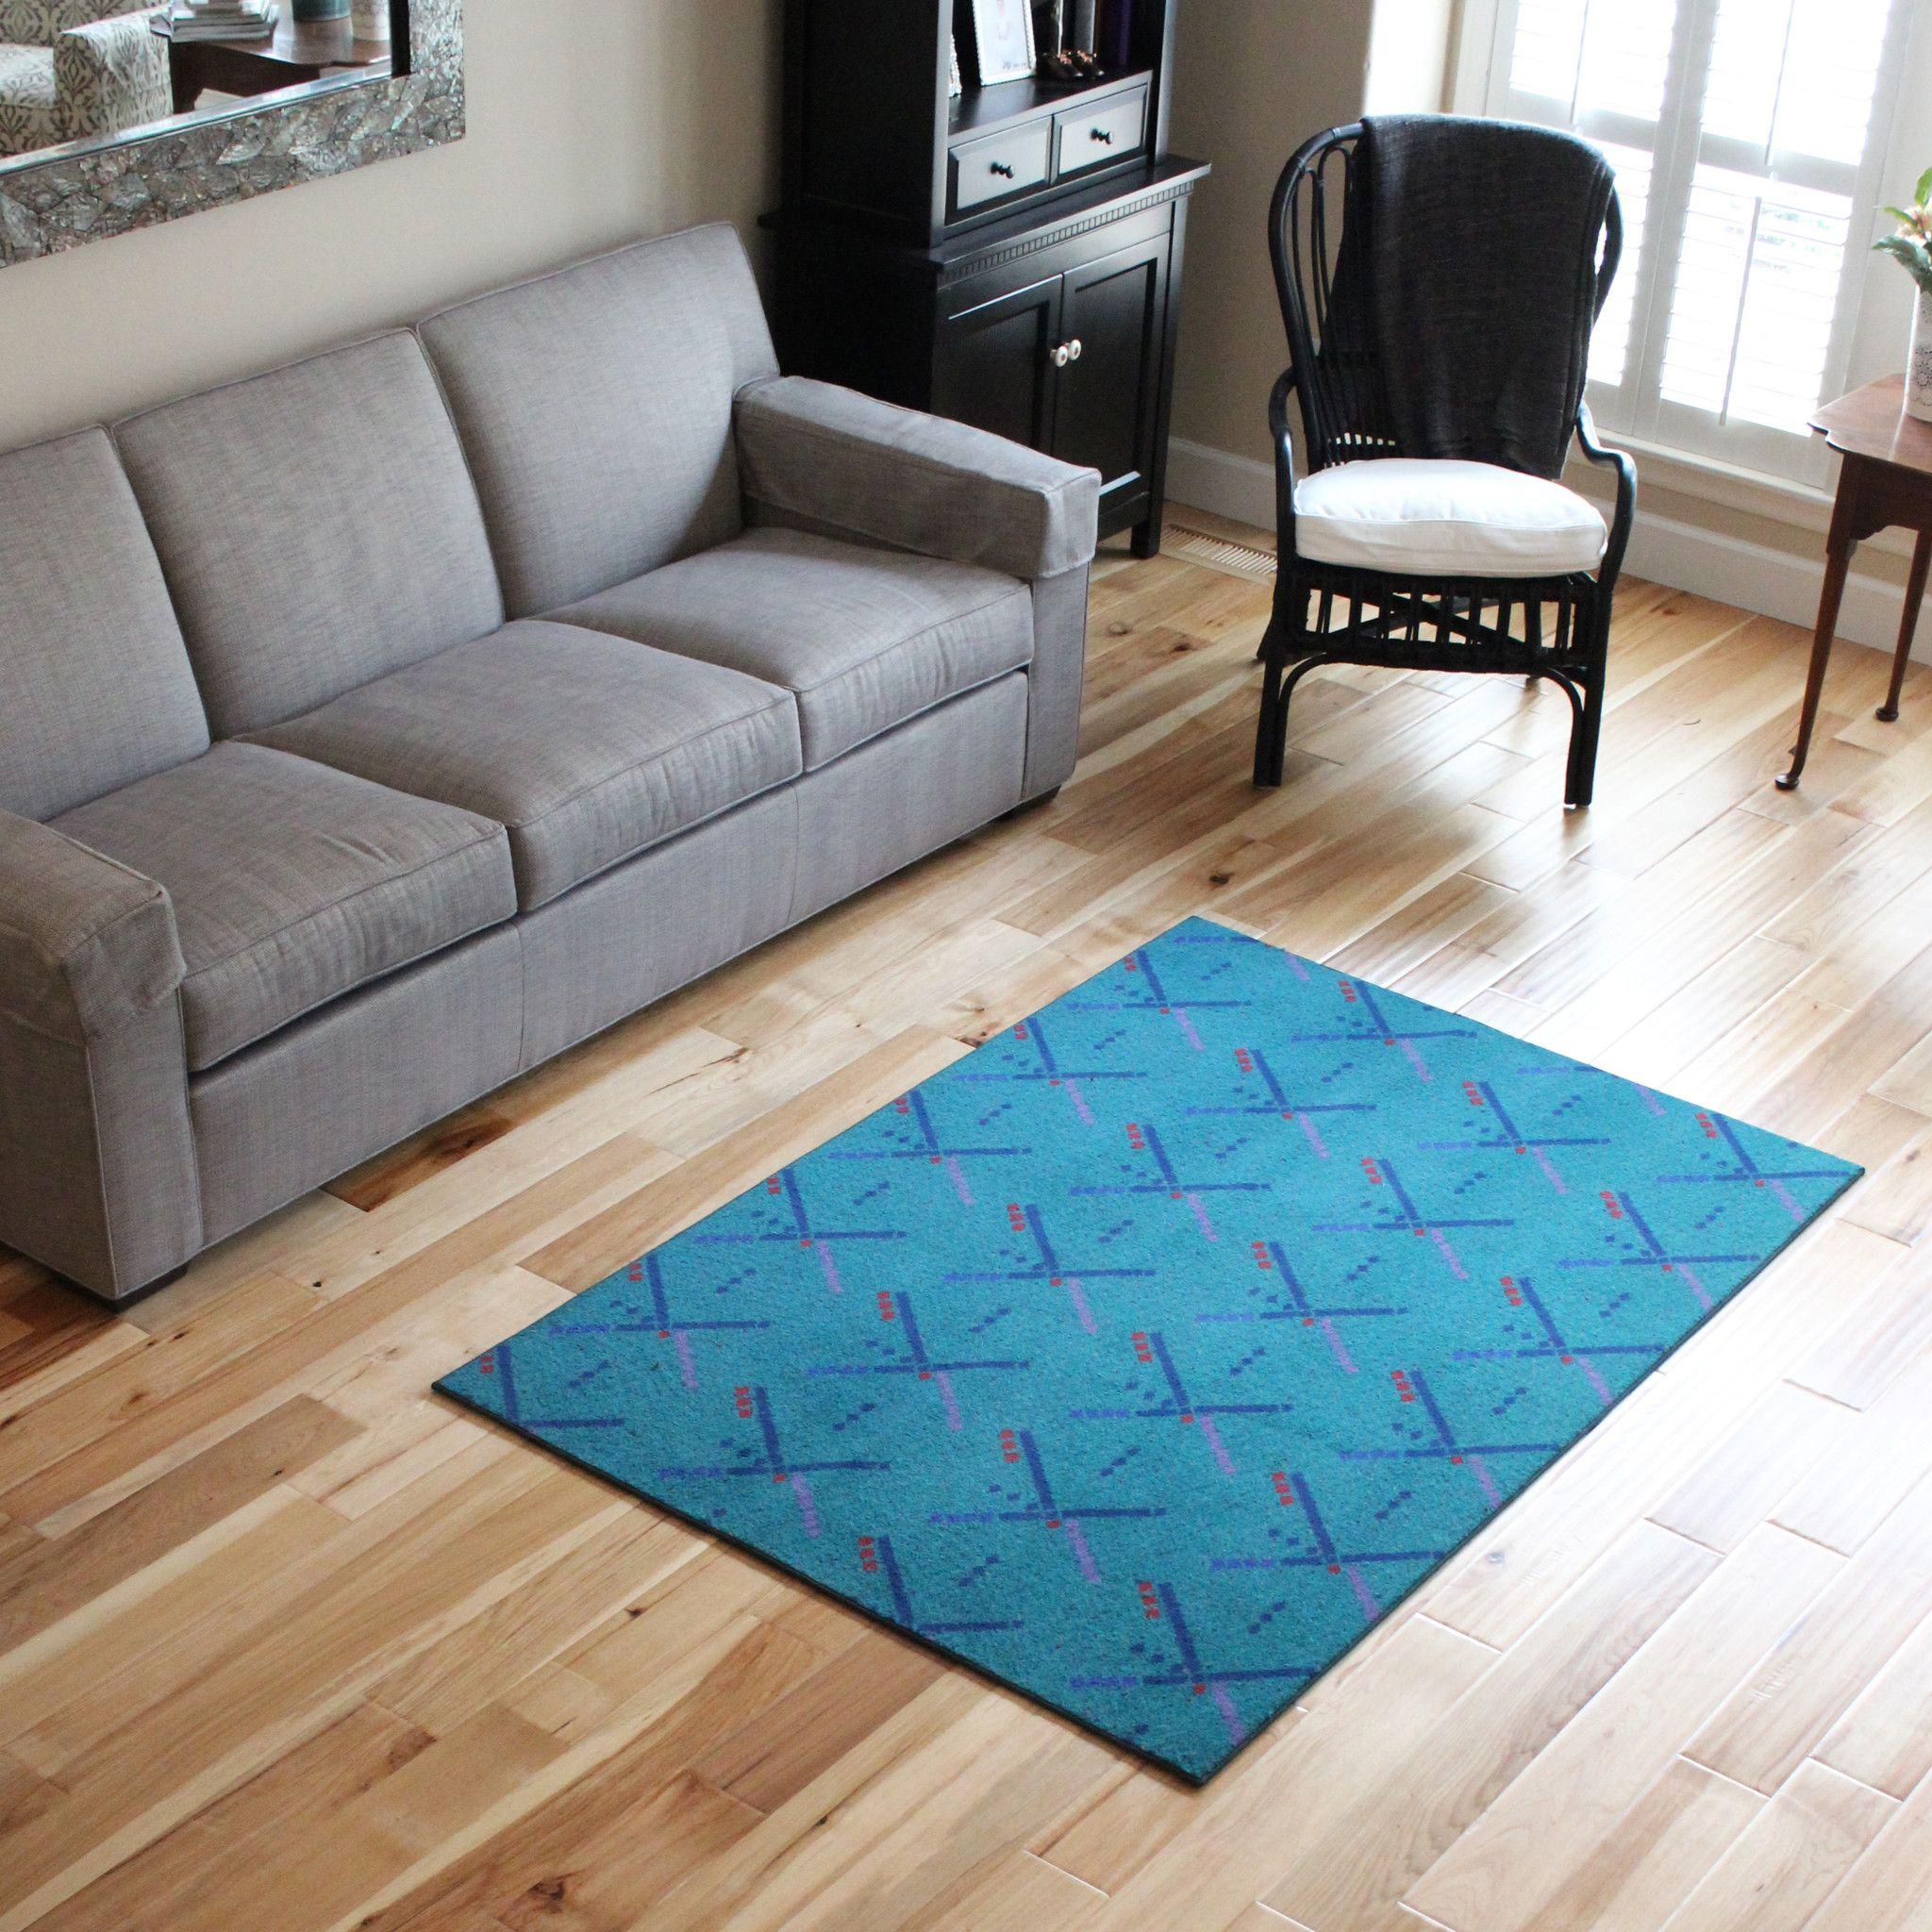 Blue 4x6 Area Rug